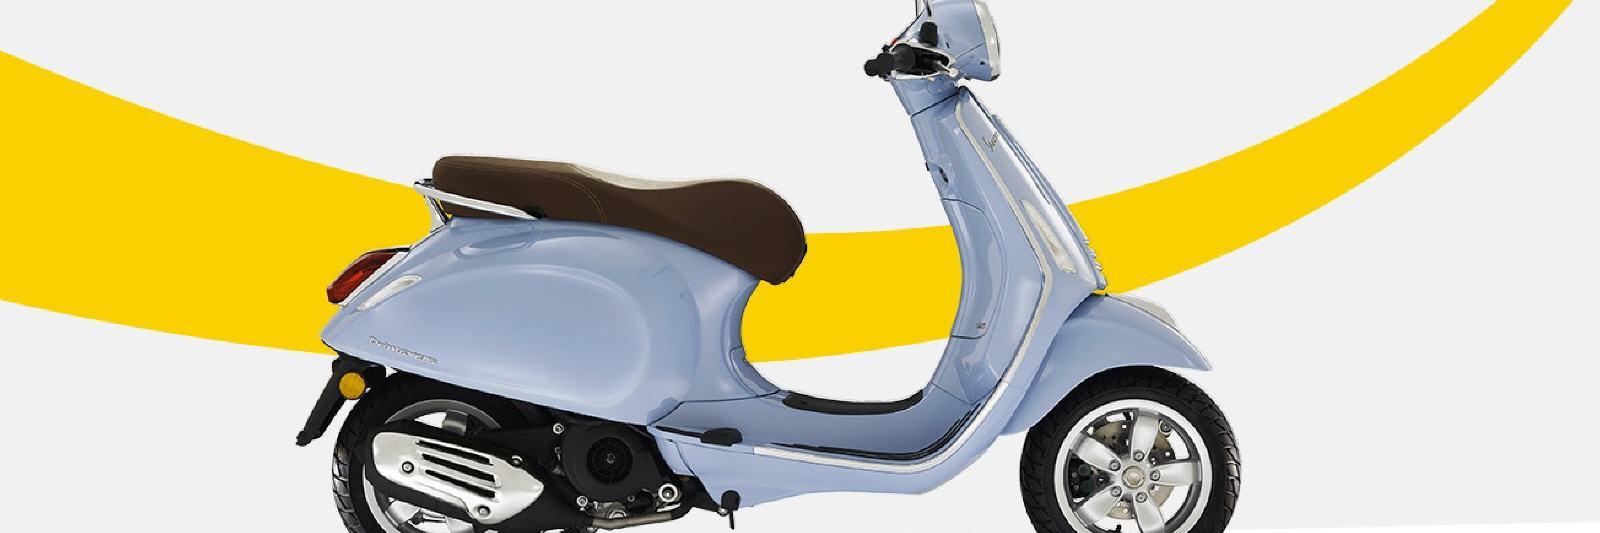 Neue Vespa Primavera 125 Ccm